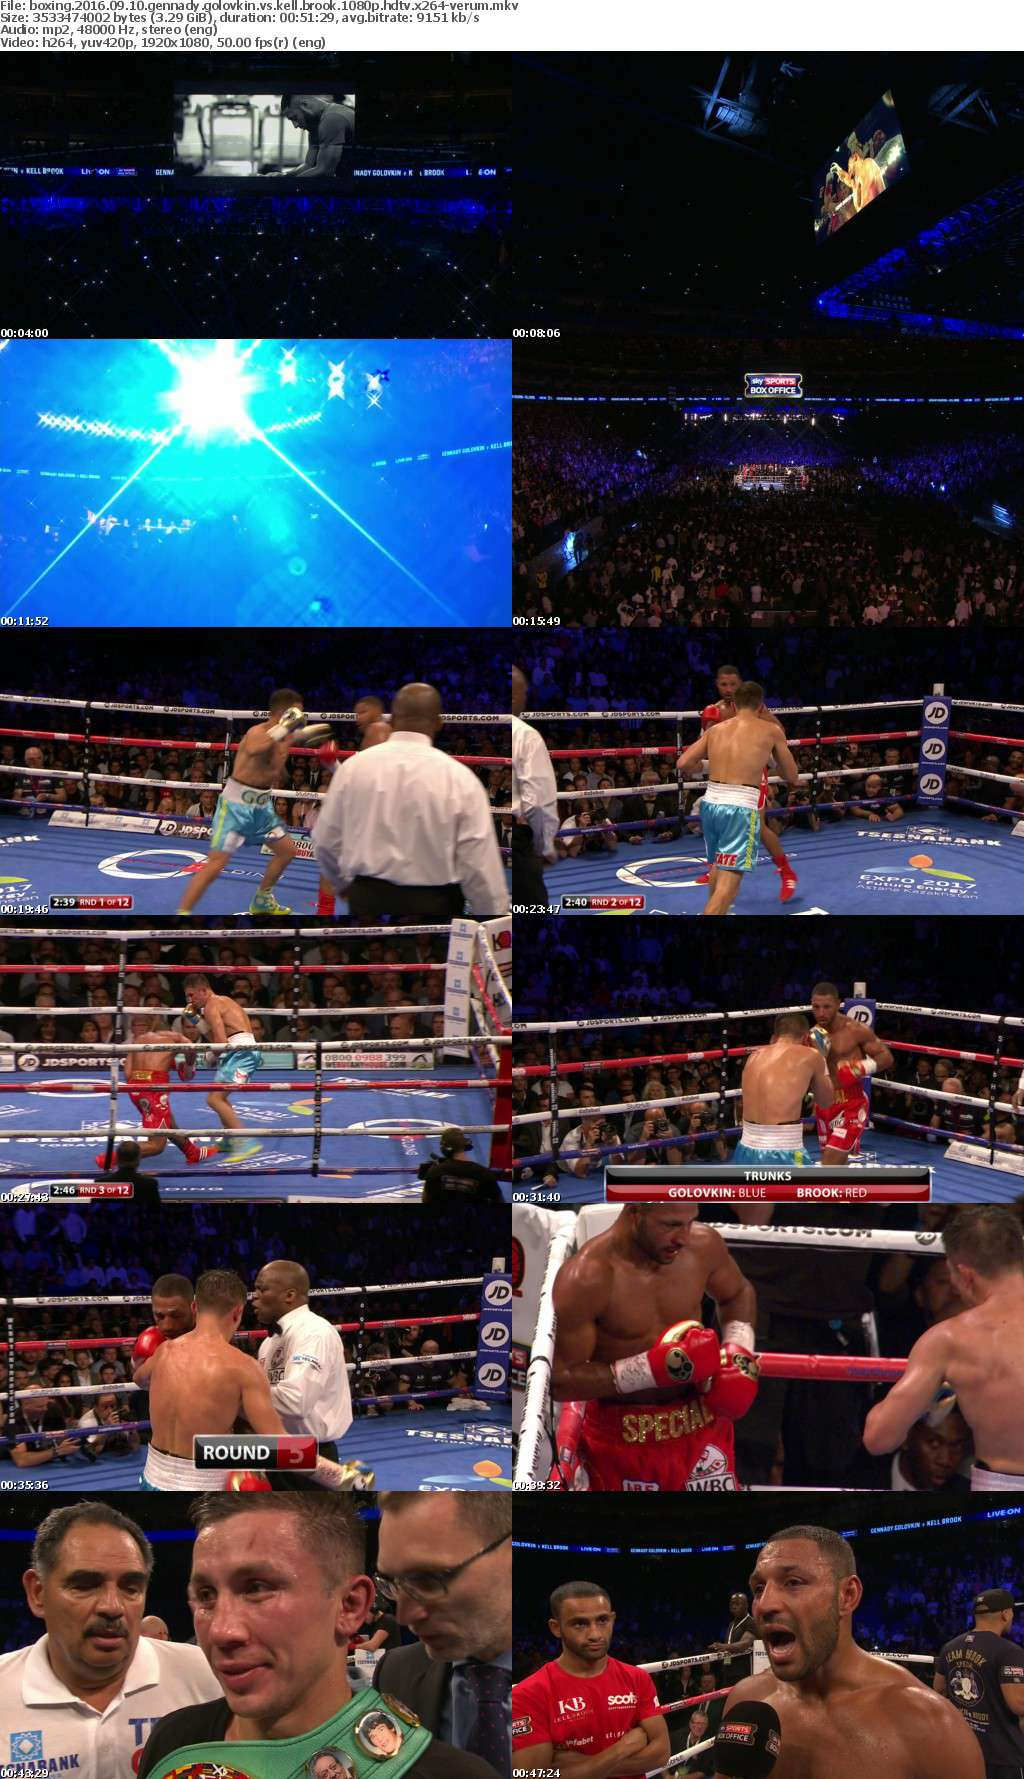 Boxing 2016 09 10 Gennady Golovkin vs Kell Brook 1080p HDTV x264-VERUM